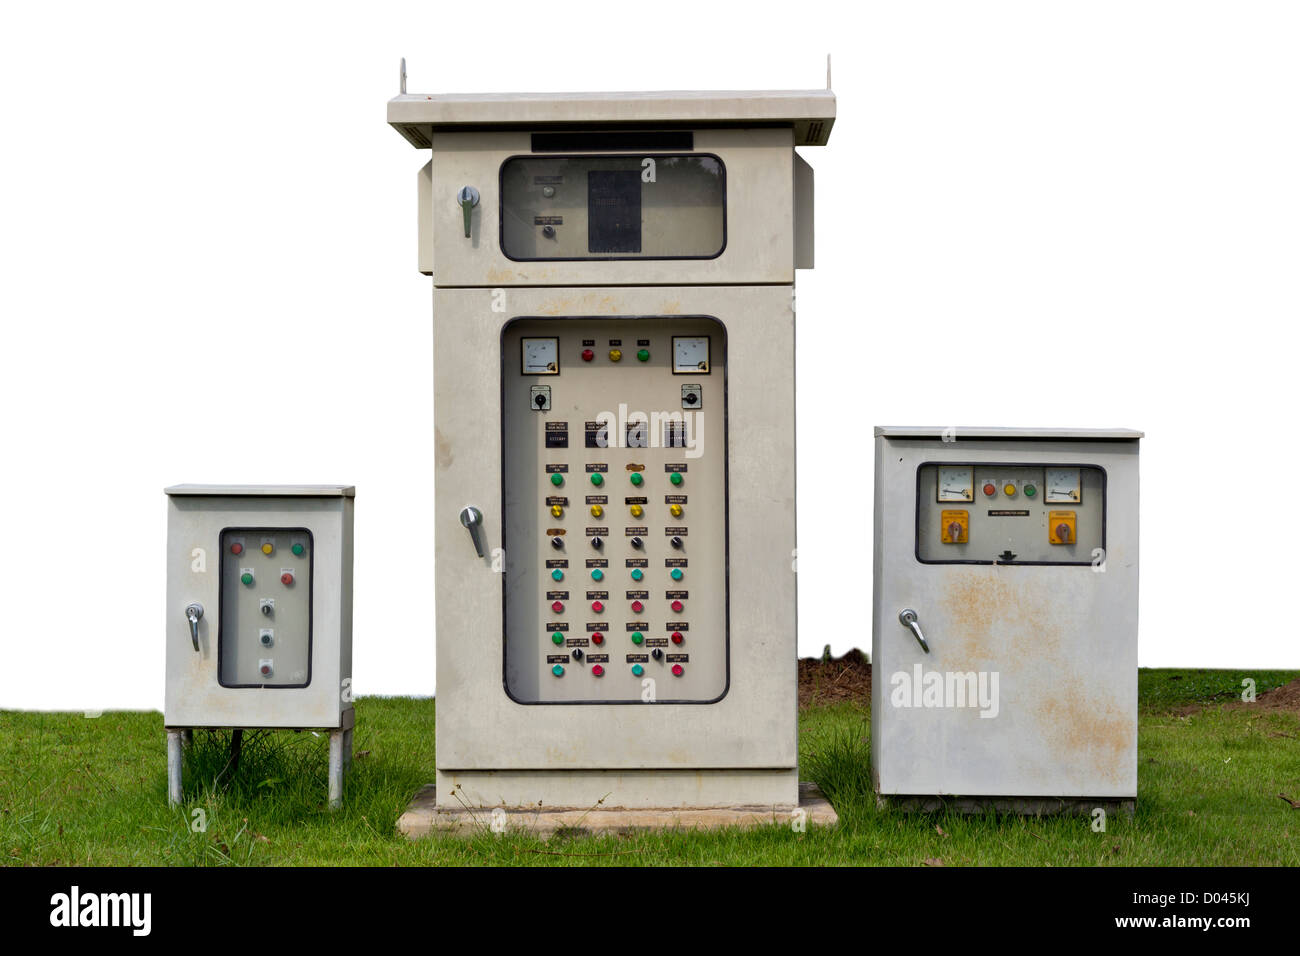 3 Switches Stockfotos & 3 Switches Bilder - Alamy